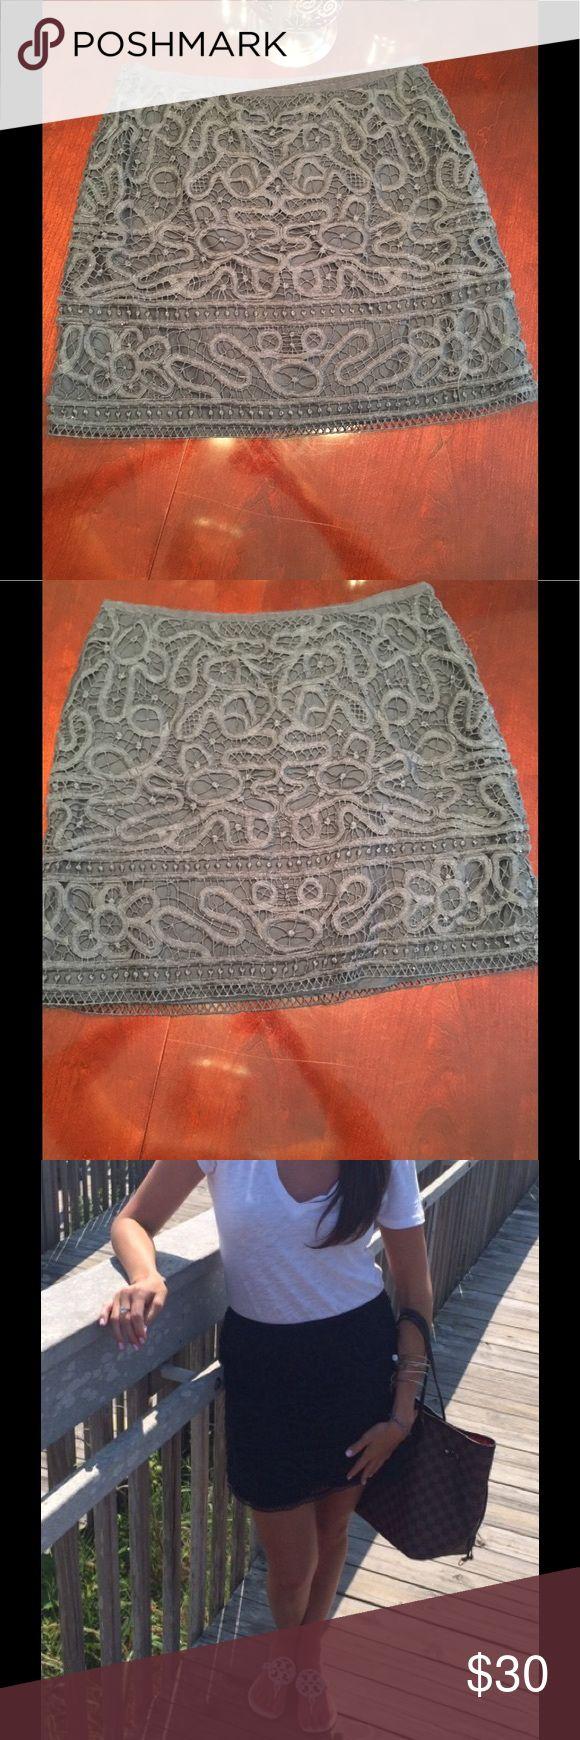 Navy blue lace mini skirt Navy blue lace mini skirt side zipper (size 6 fits like a 4) Club Monaco Skirts Mini